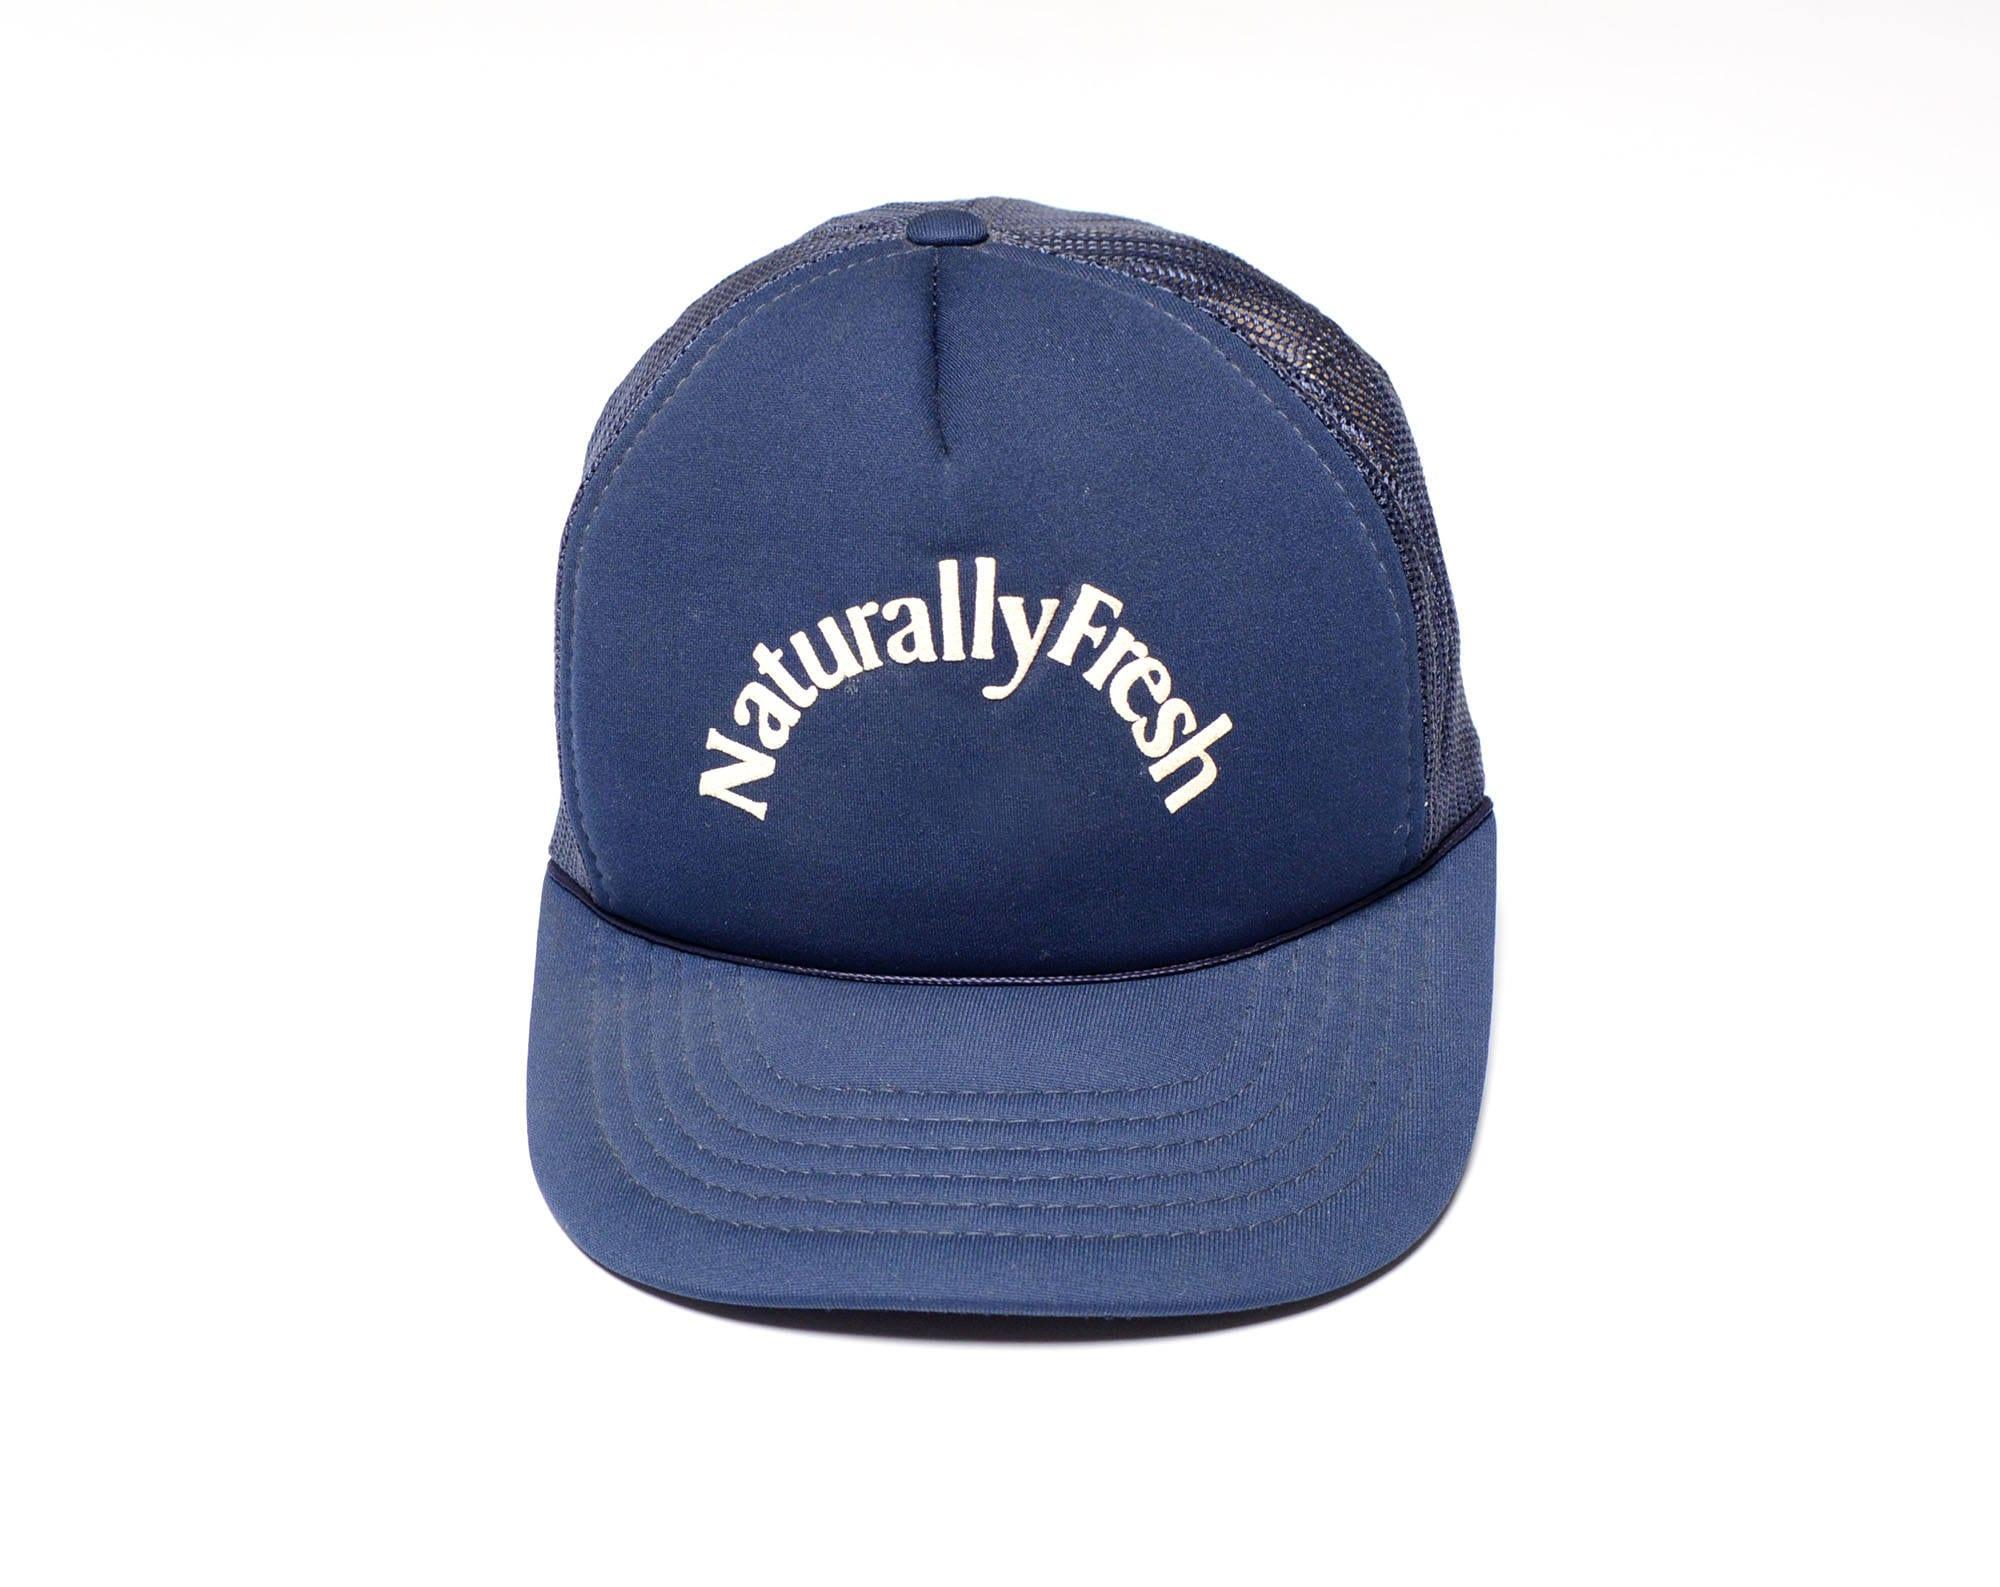 3dd32bec2d5 vintage 80s Naturally Fresh hat trucker hat navy blue mesh snapback cap hip  hop street style